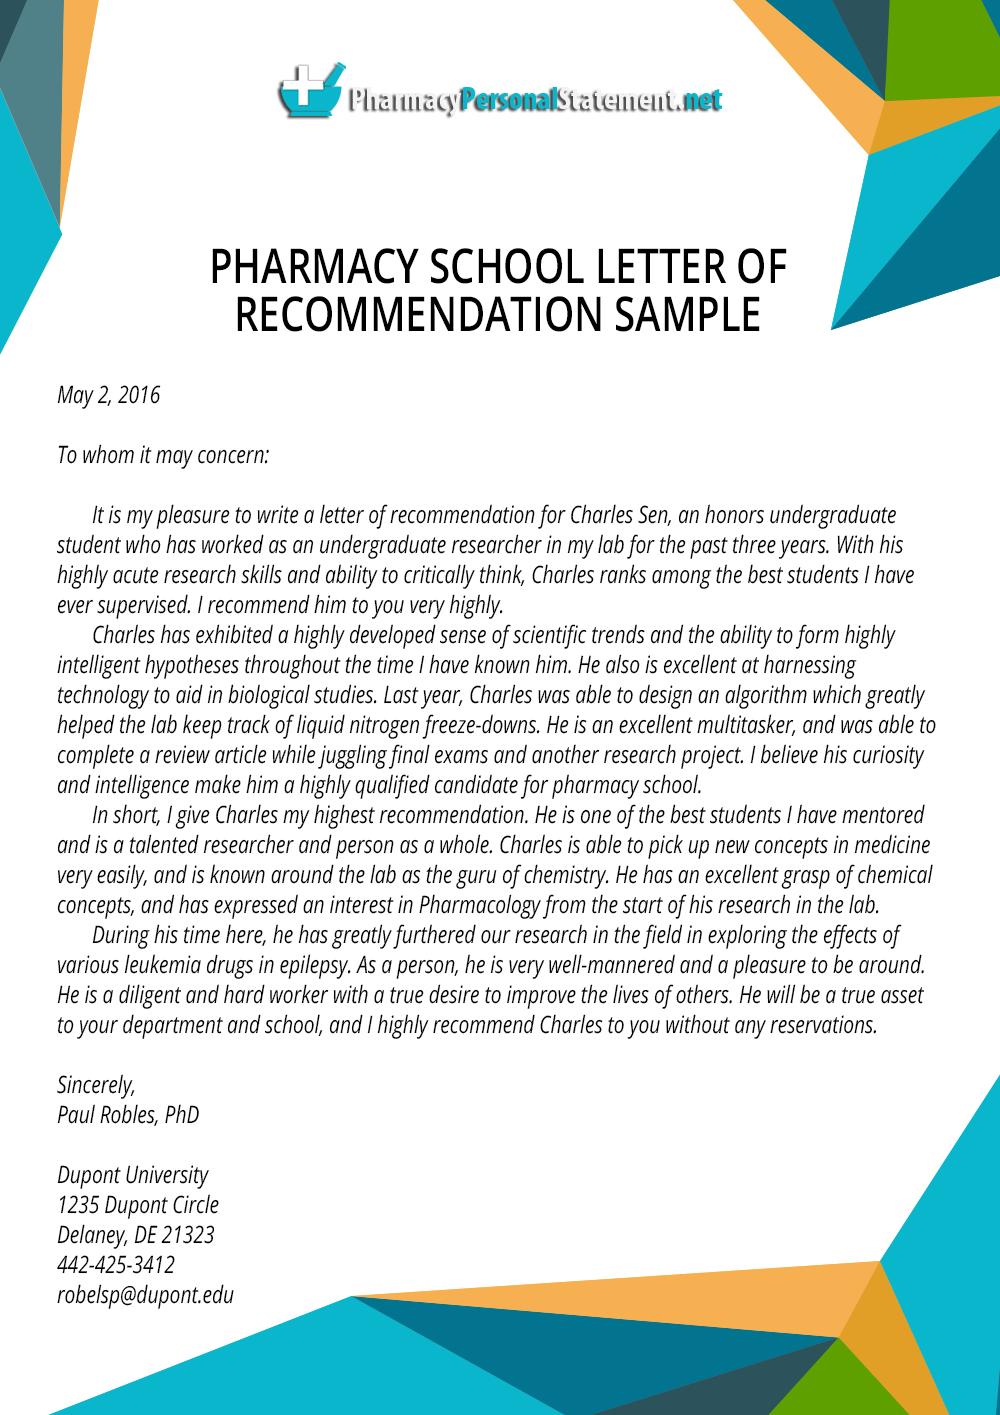 Pharmacy School Letter Of Recommendation By Pharmacyapplication On Deviantart